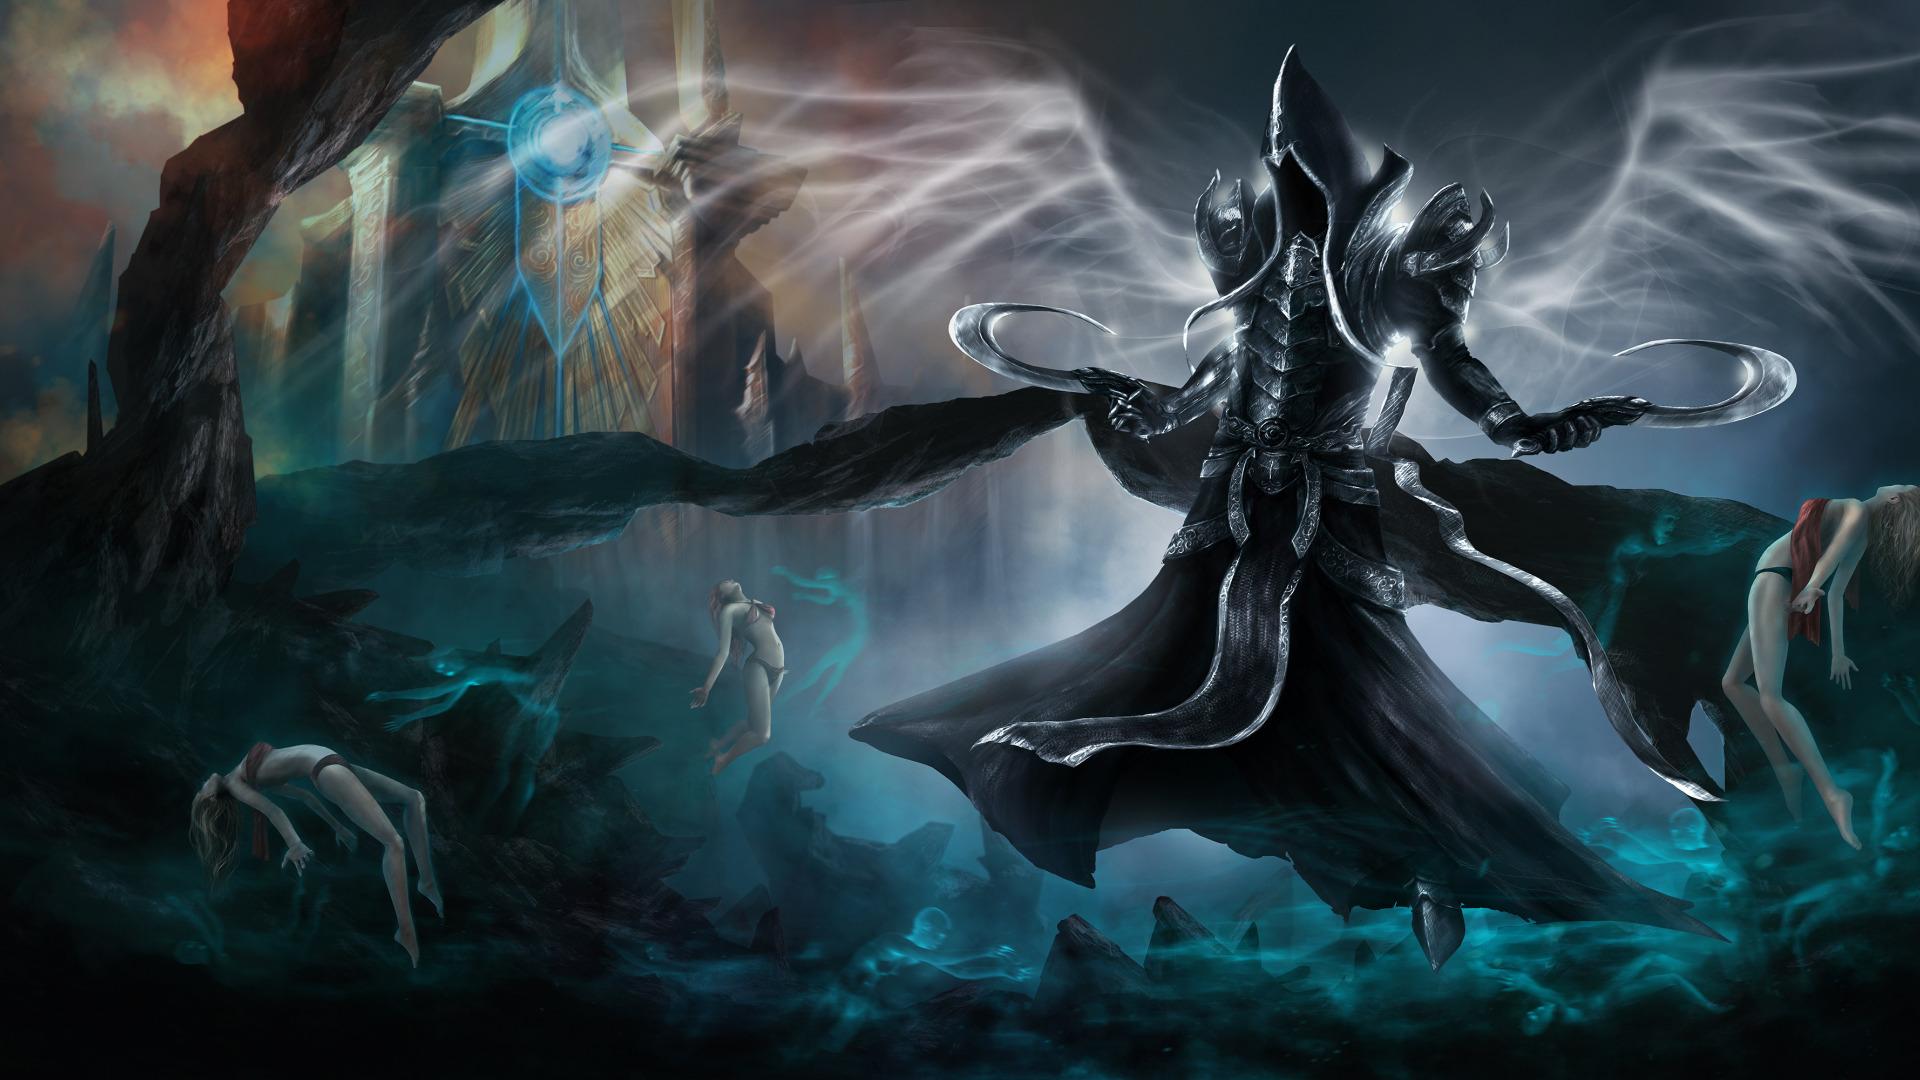 Download Wallpaper Darkness Diablo 3 Diablo Iii Reaper Of Souls